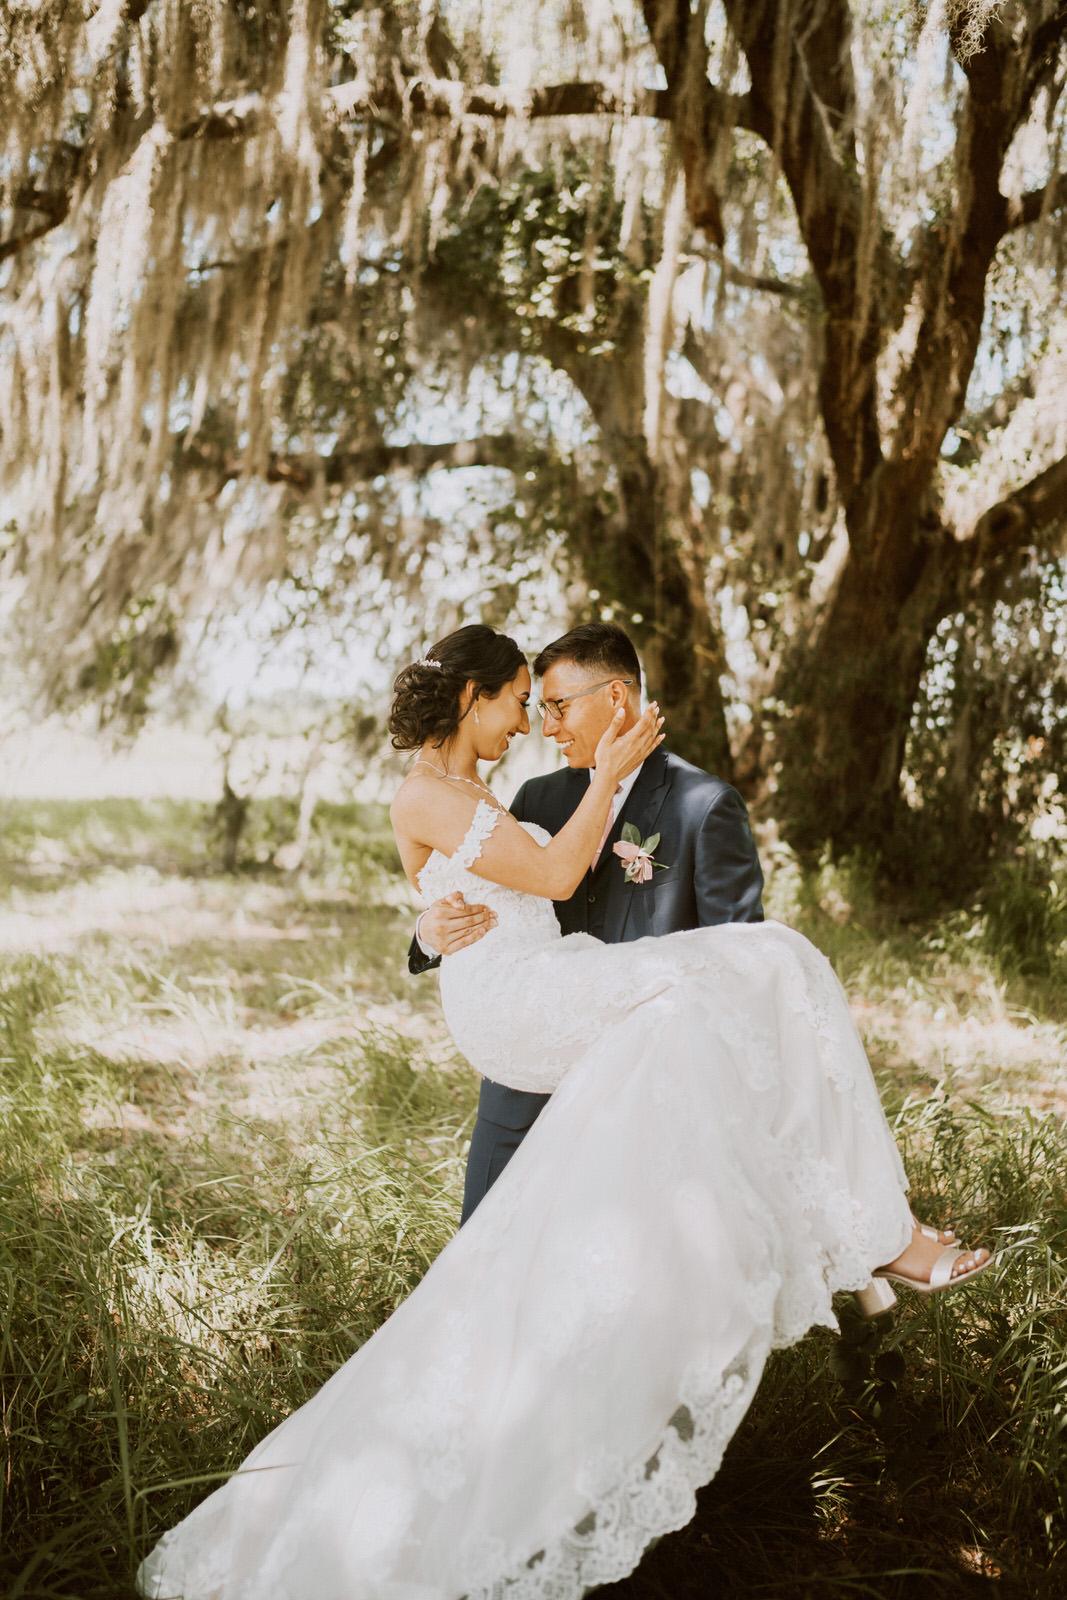 South Florida  Boho Inspired Spring Wedding - Michelle Gonzalez Photography - Nancy and Daniel-395.jpg